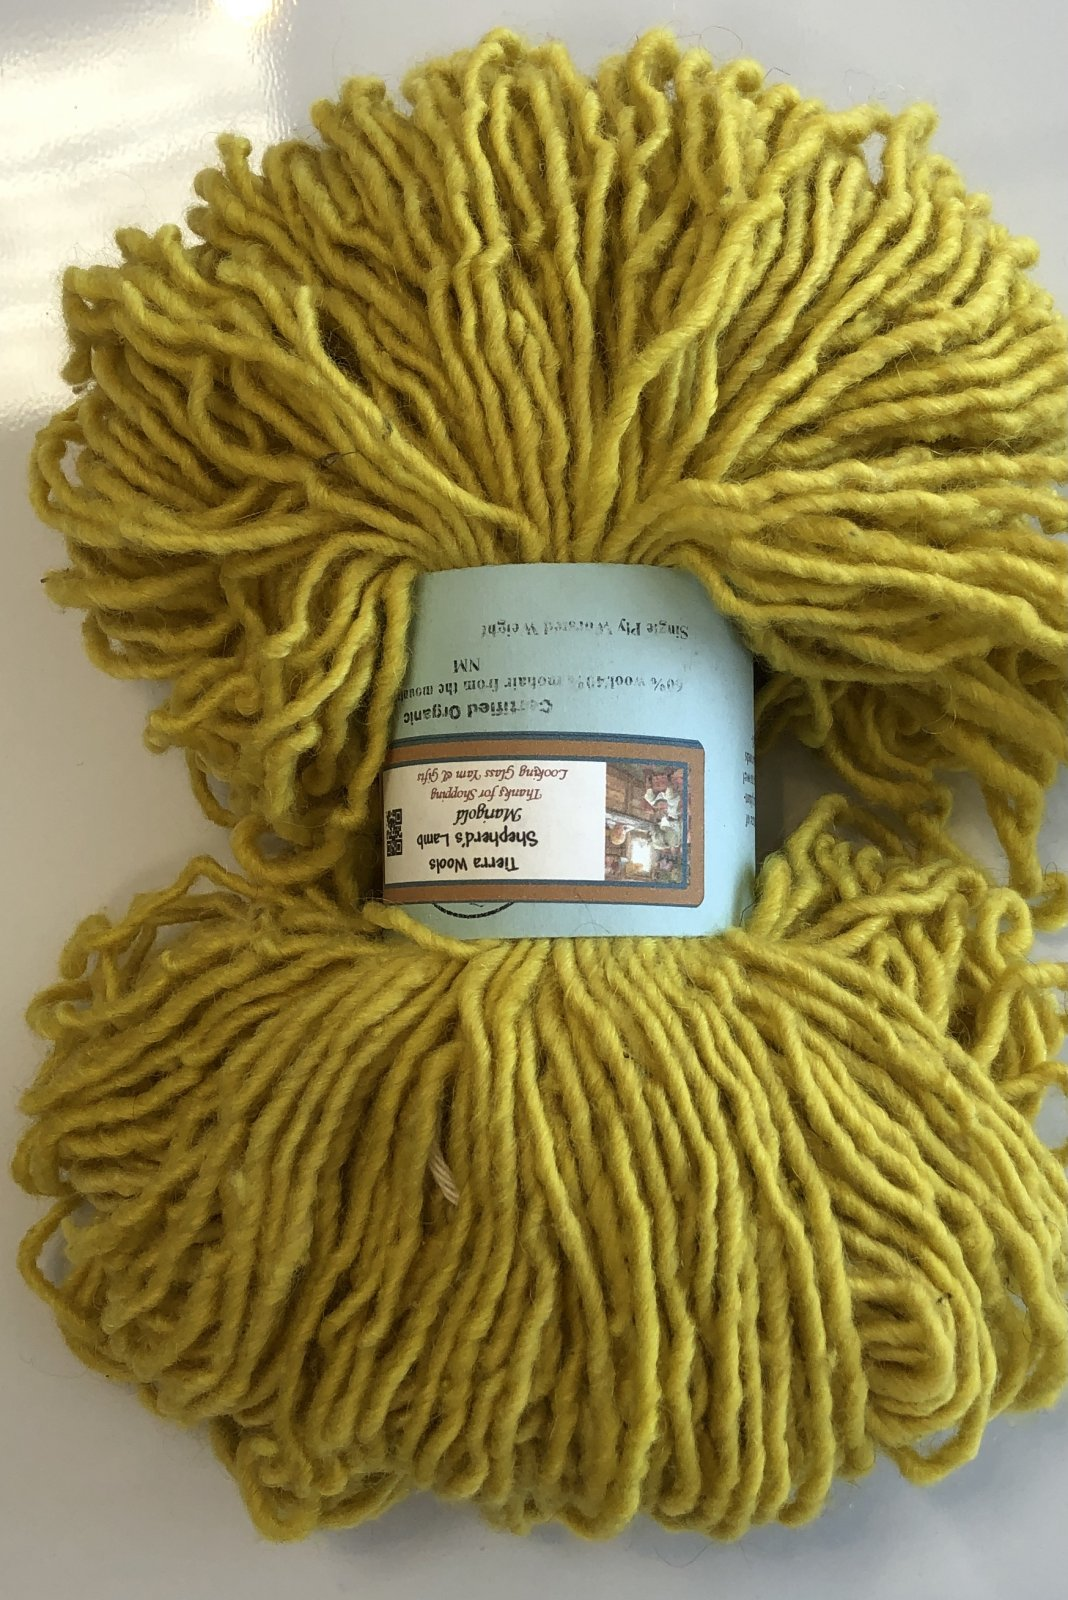 Tierra Wools Shepherd's Lamb Organic